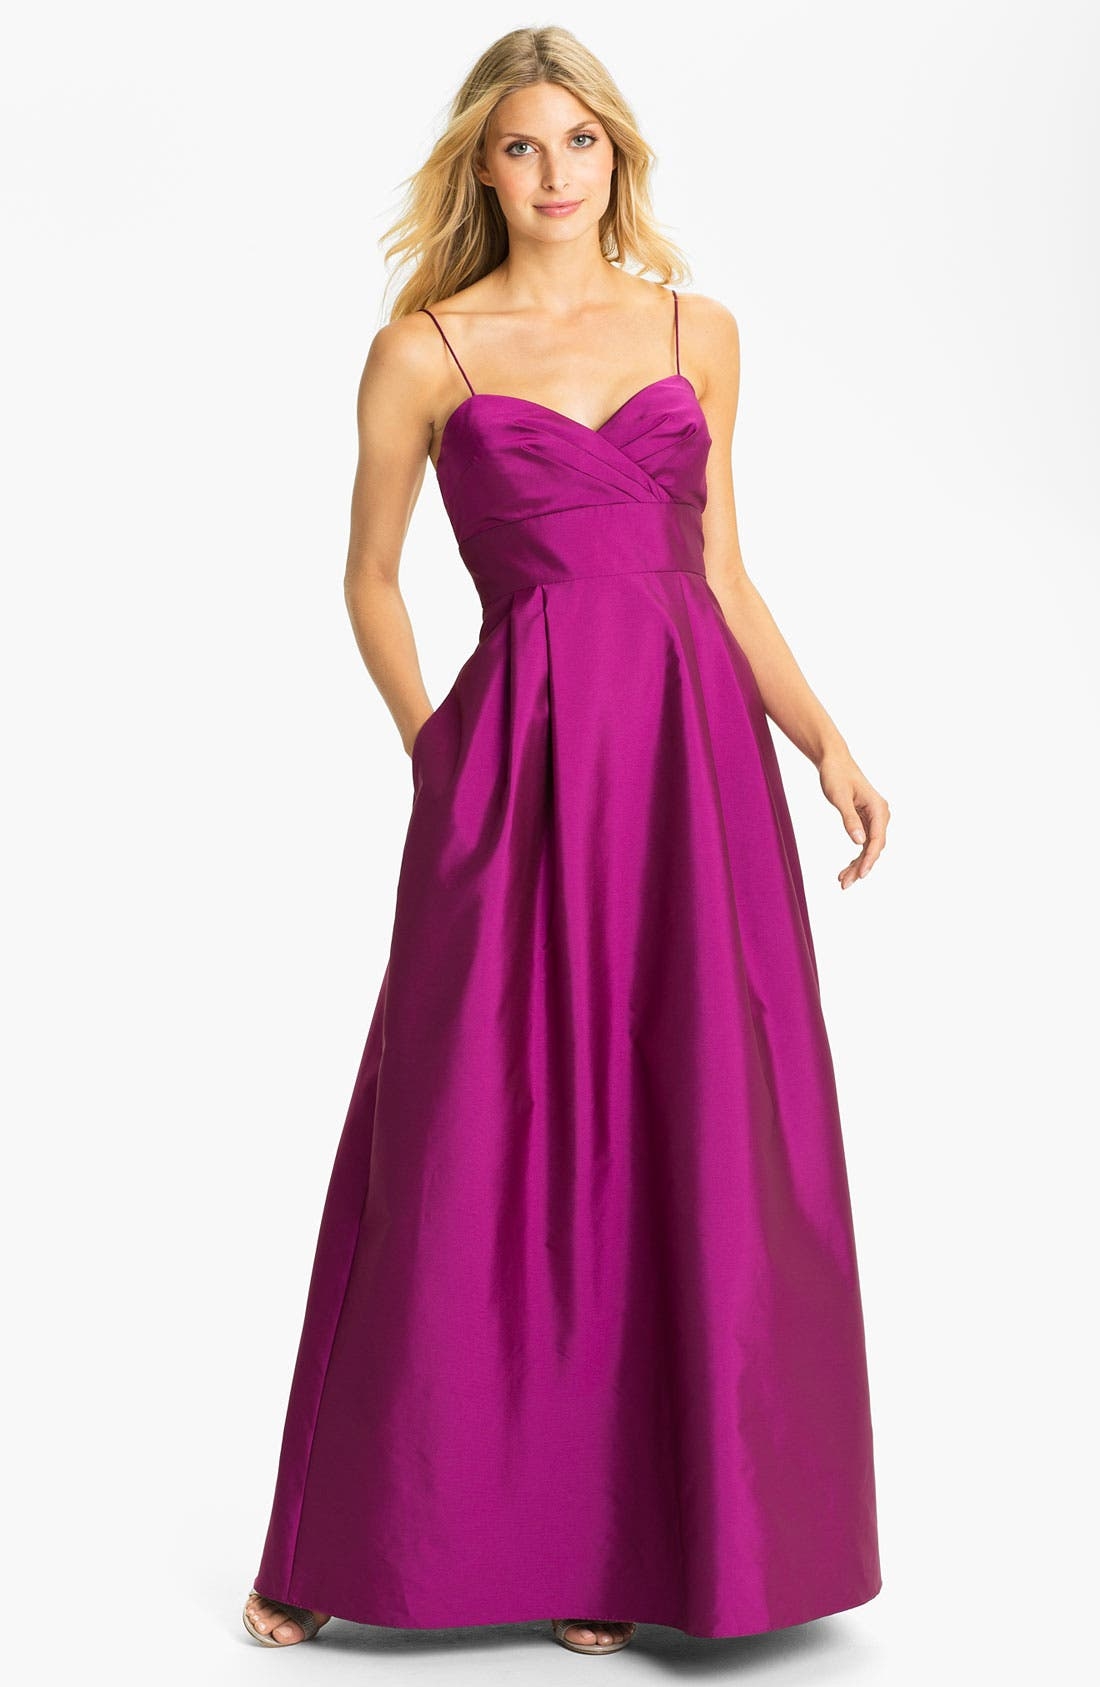 Main Image - Eliza J Spaghetti Strap Faille A-Line Gown